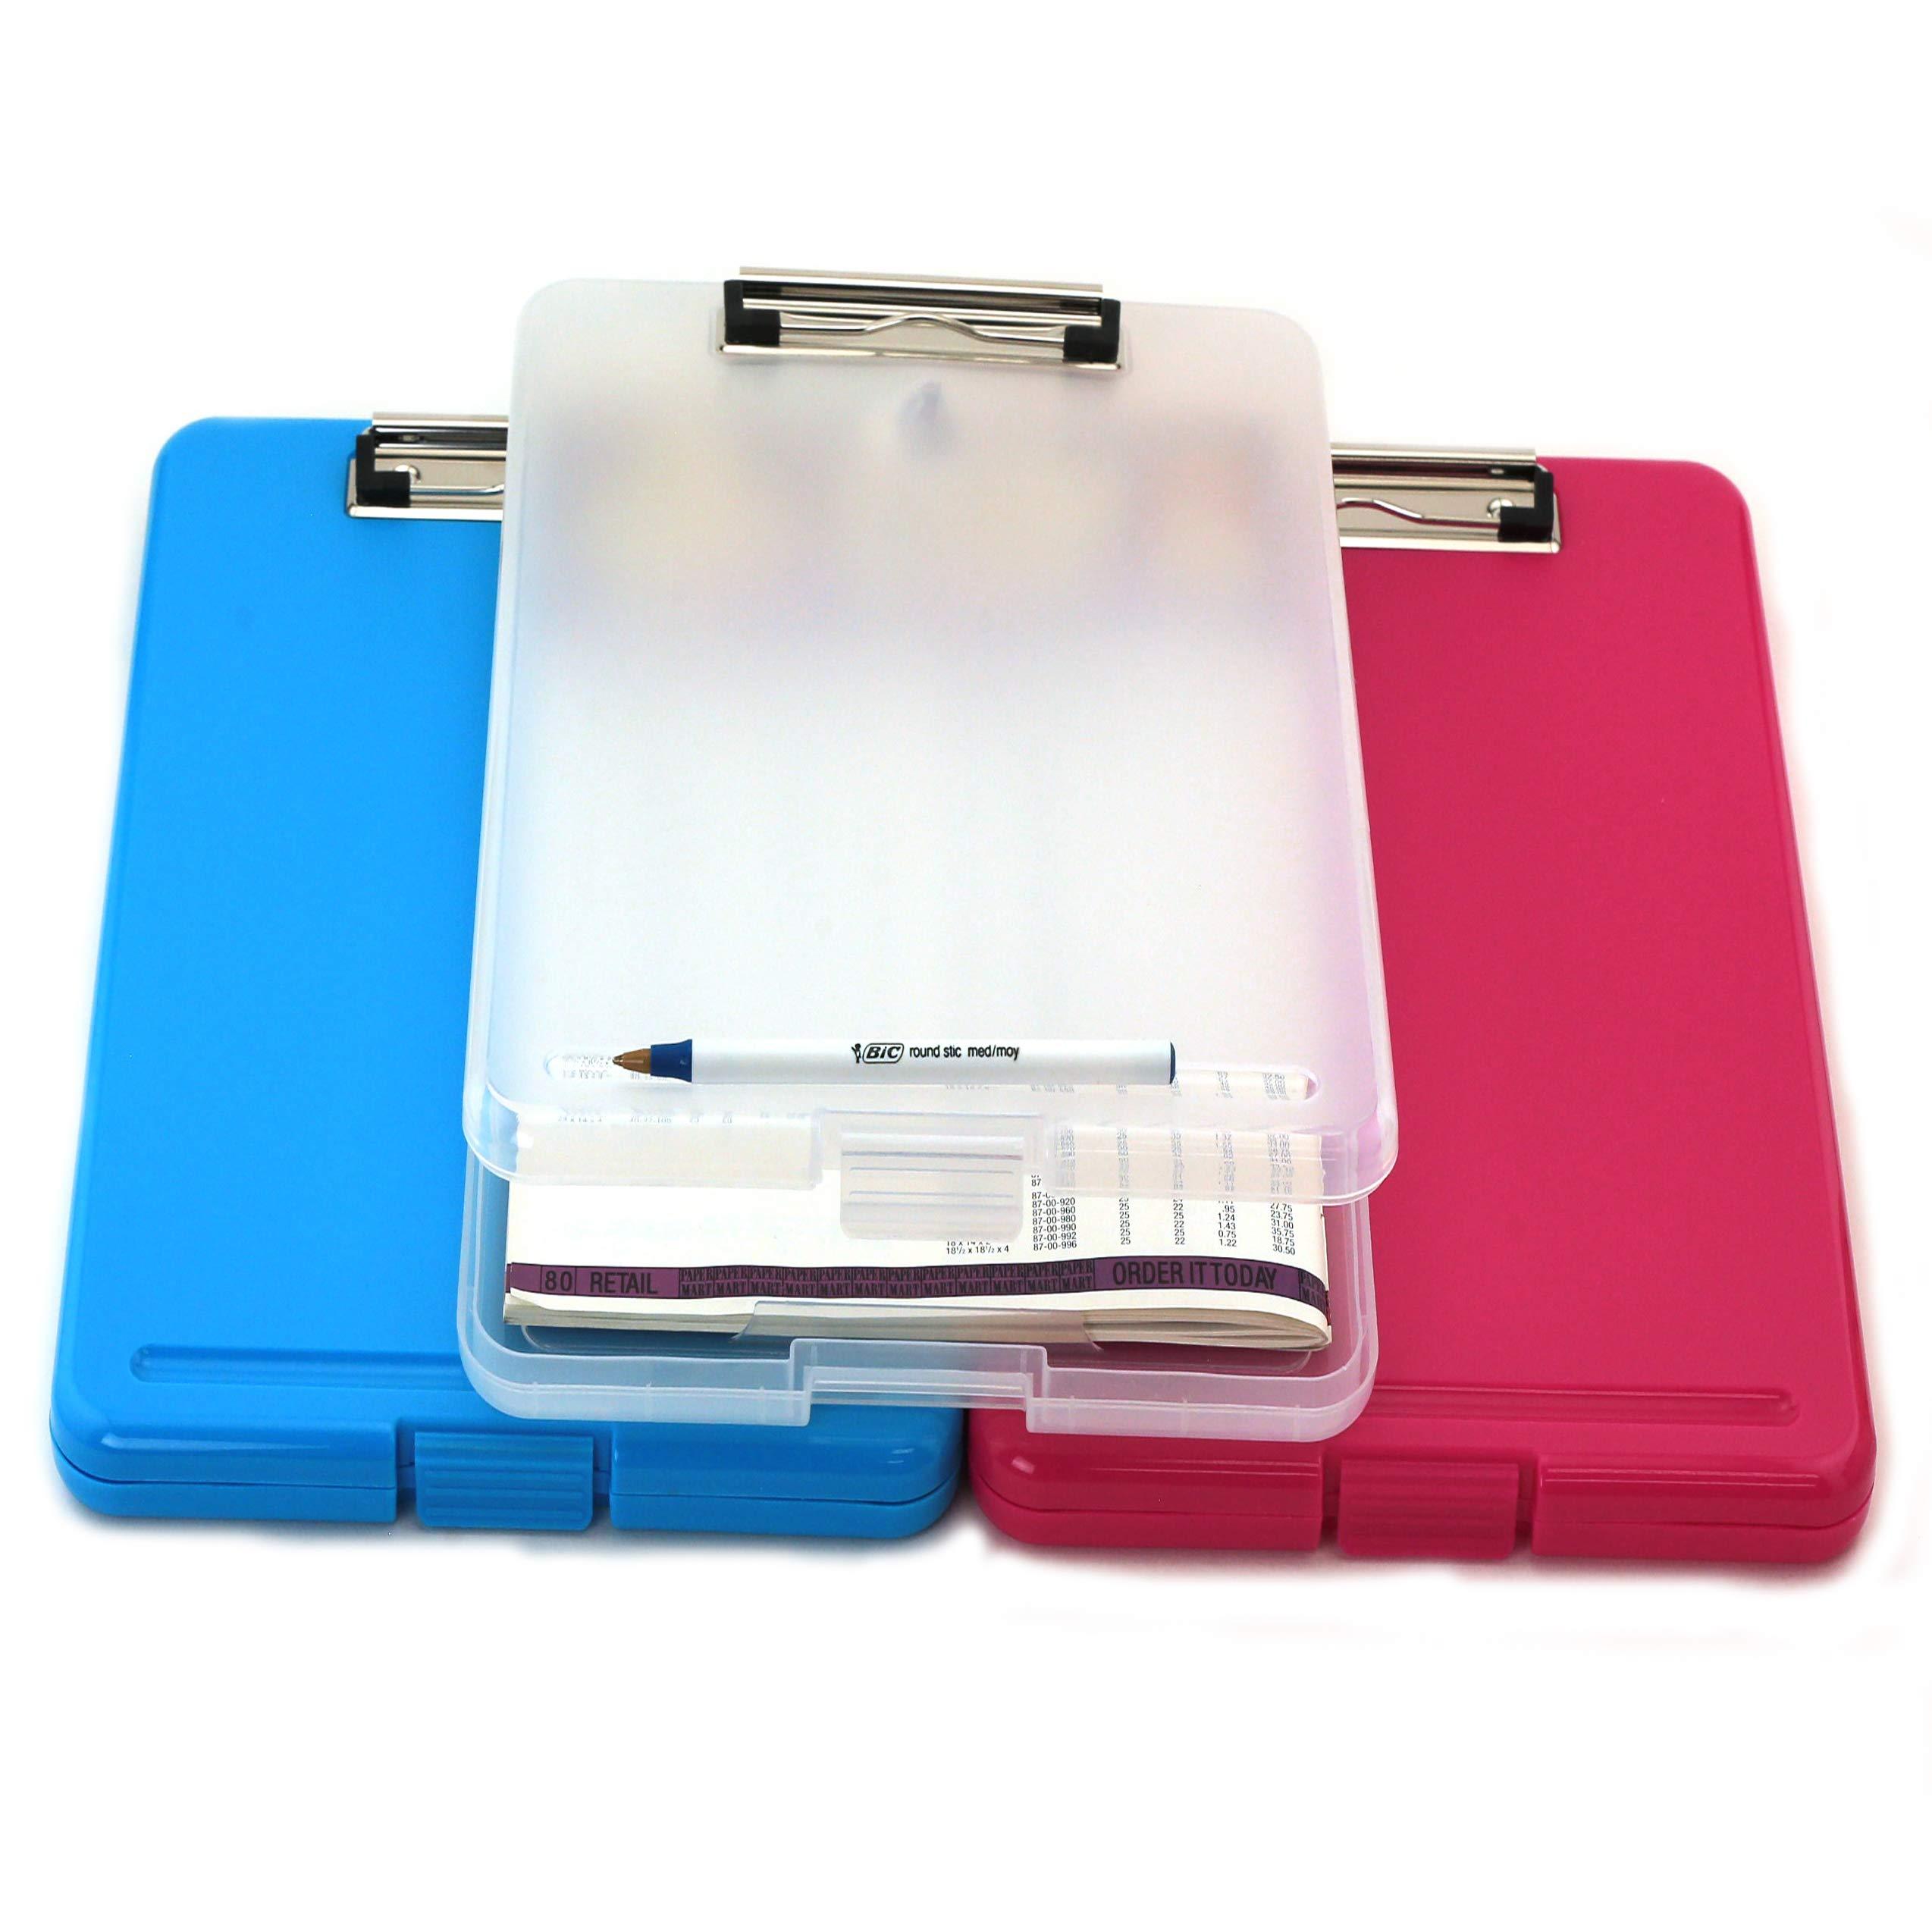 3PC/Set Letter Size Plastic Storage Clipboard Fuchsia, Clear, Sky Blue